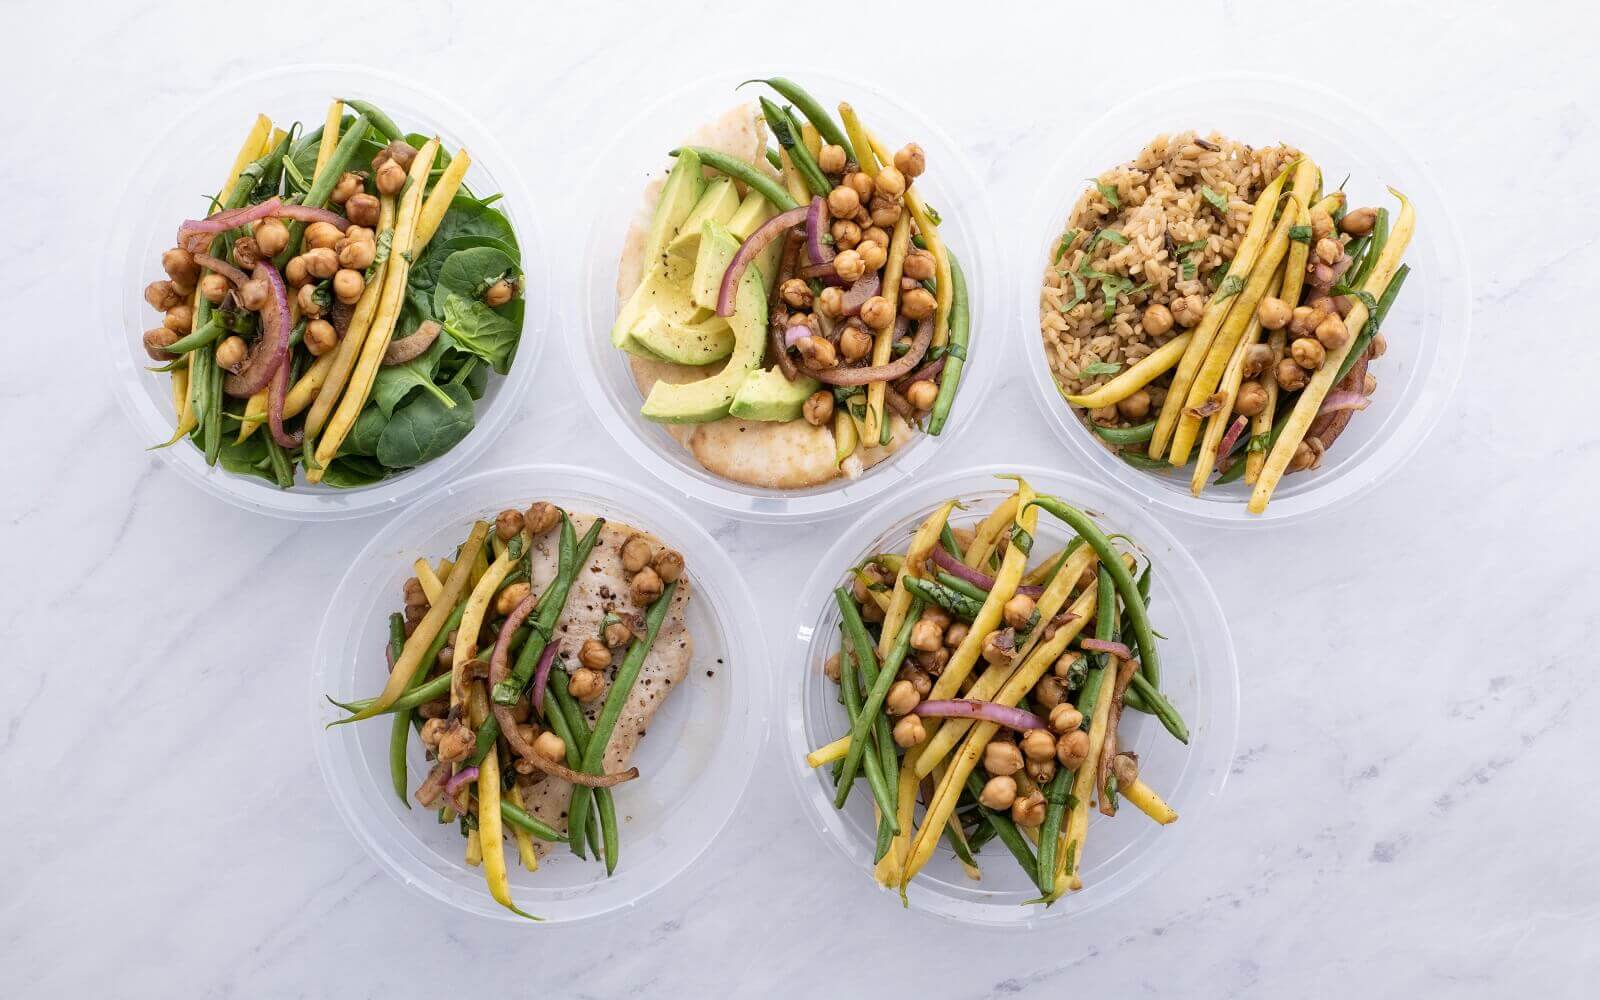 French Bean Refrigerator Salad